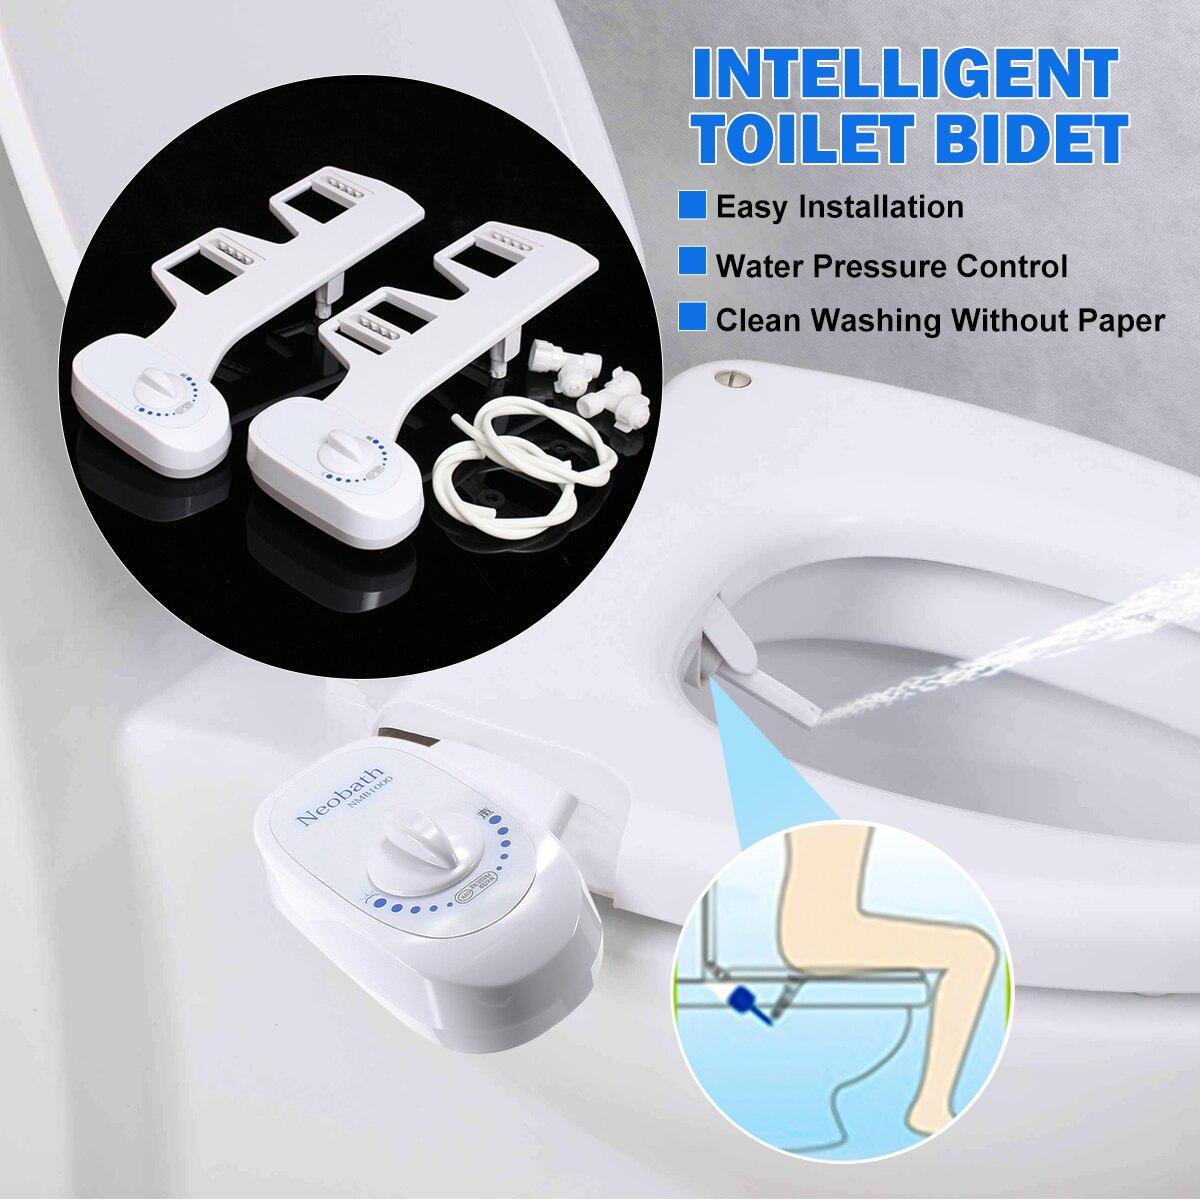 Cold Water Non-Electric Single Nozzle Bathroom Toilet Seat Bidet Sprayer Adjustable Sprayer Nozzle Sprinkle  1/2''  15/16''